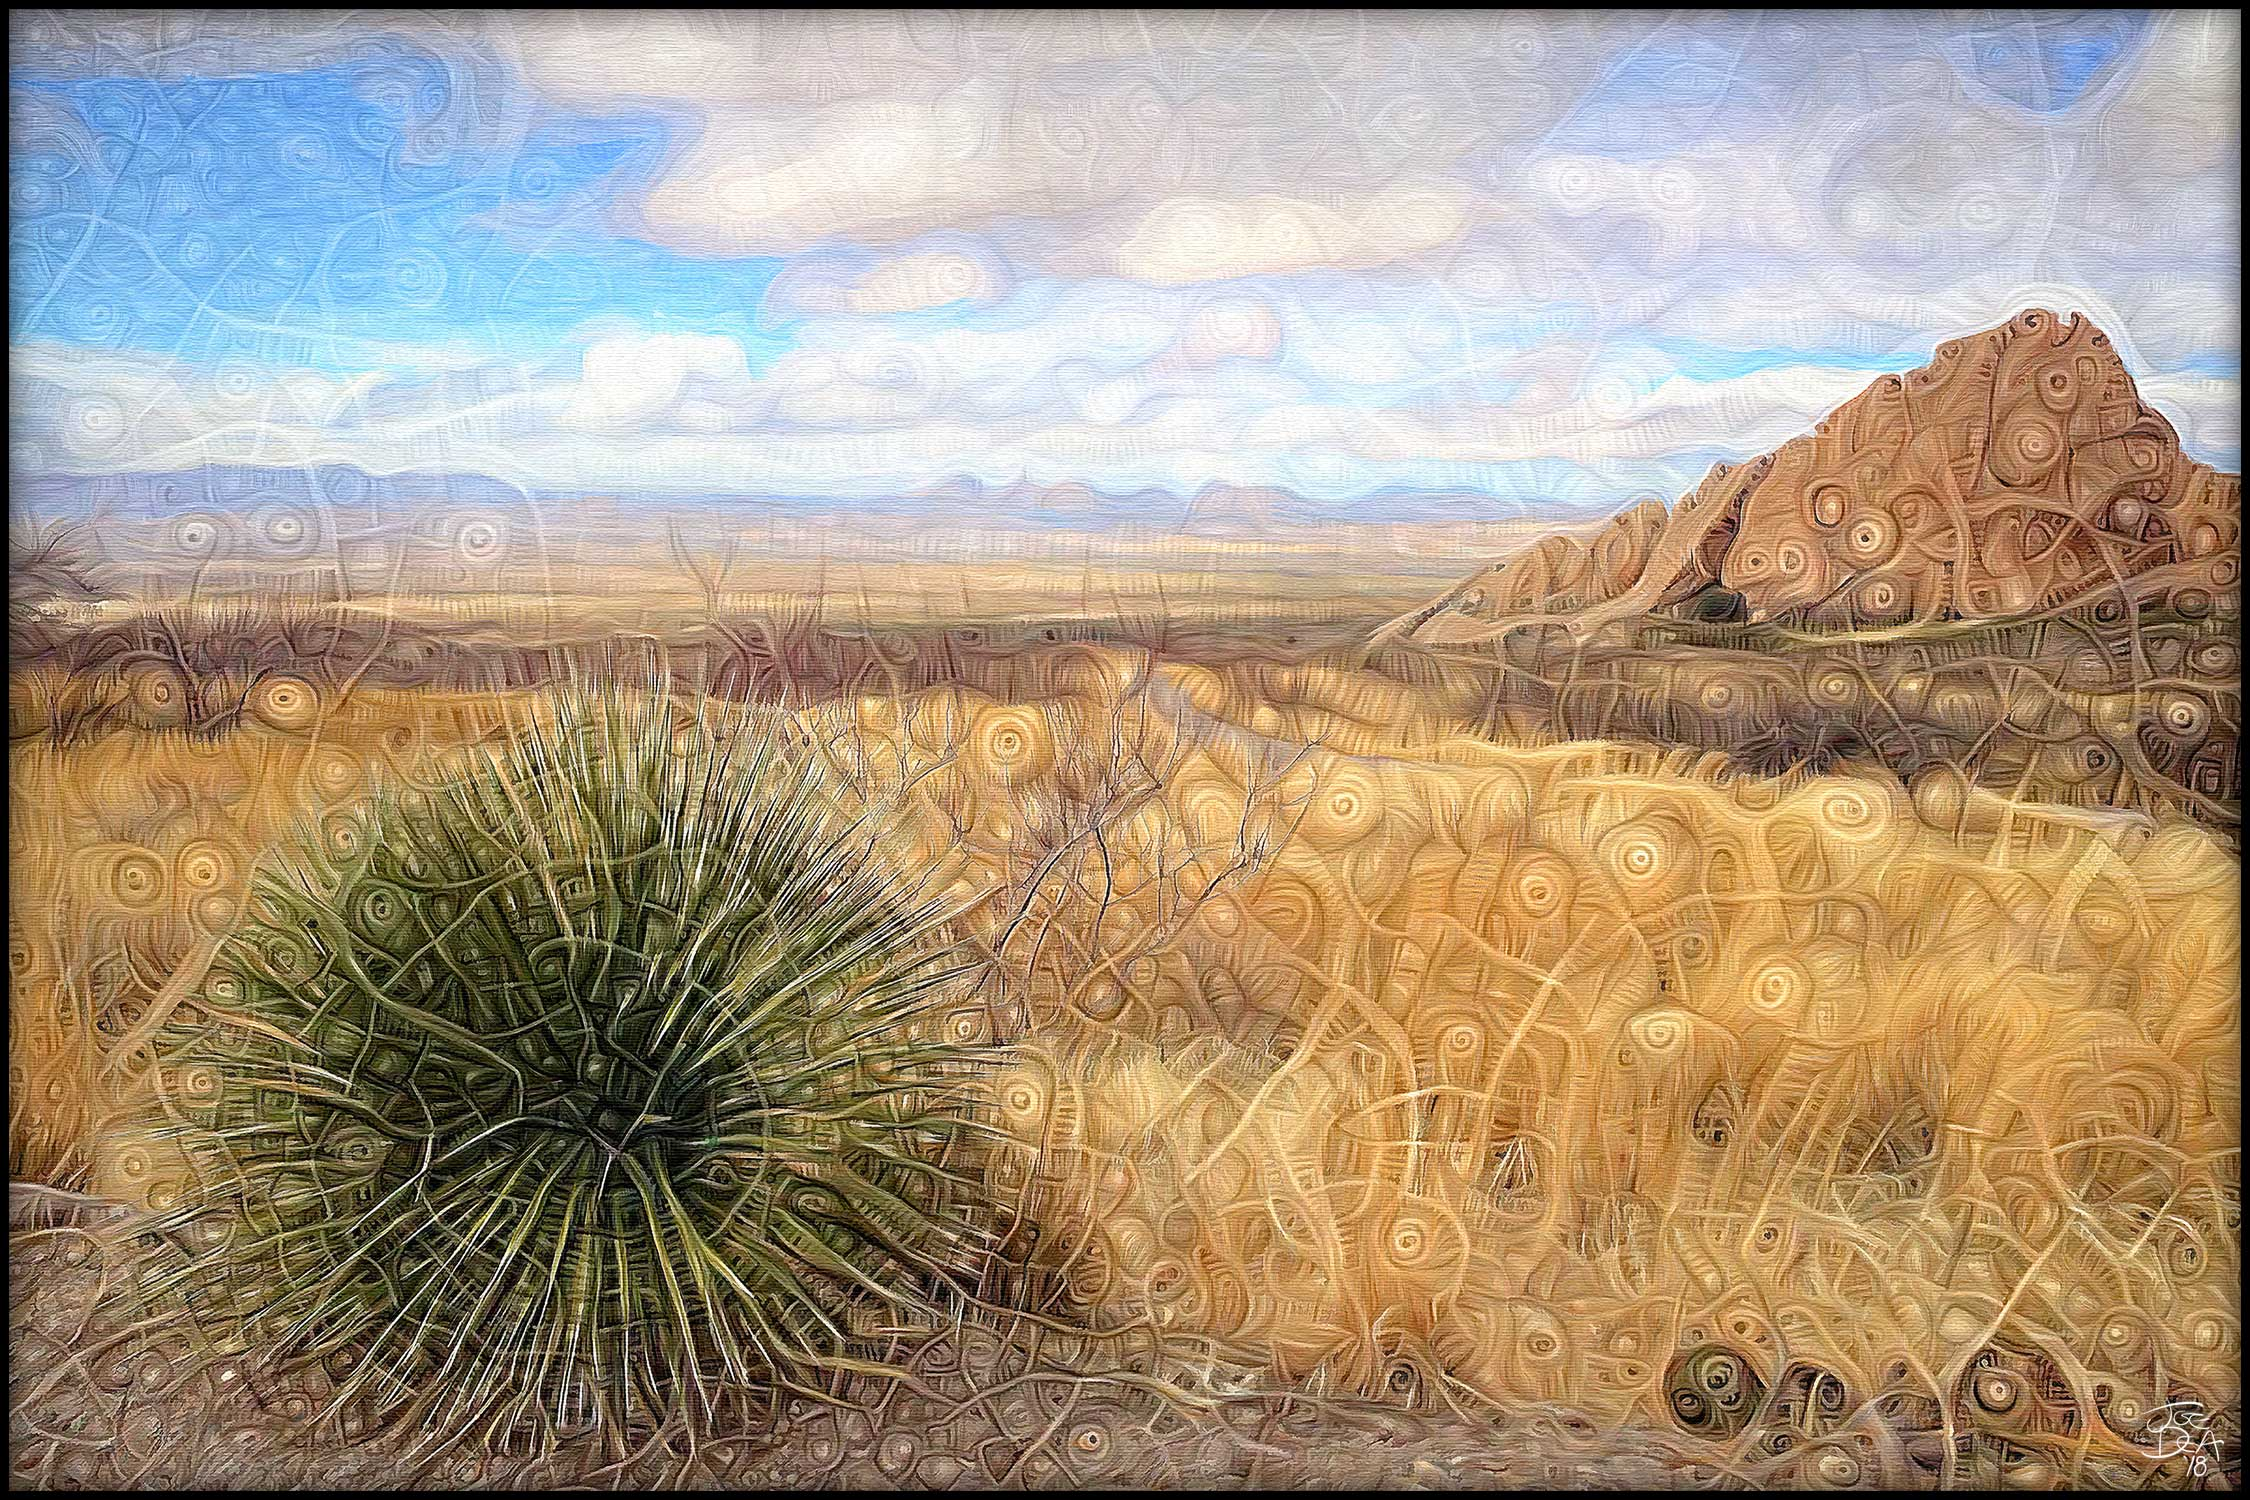 Joe_Dea_Landscape_painting_Dripping-Springs-2-WEB.jpg